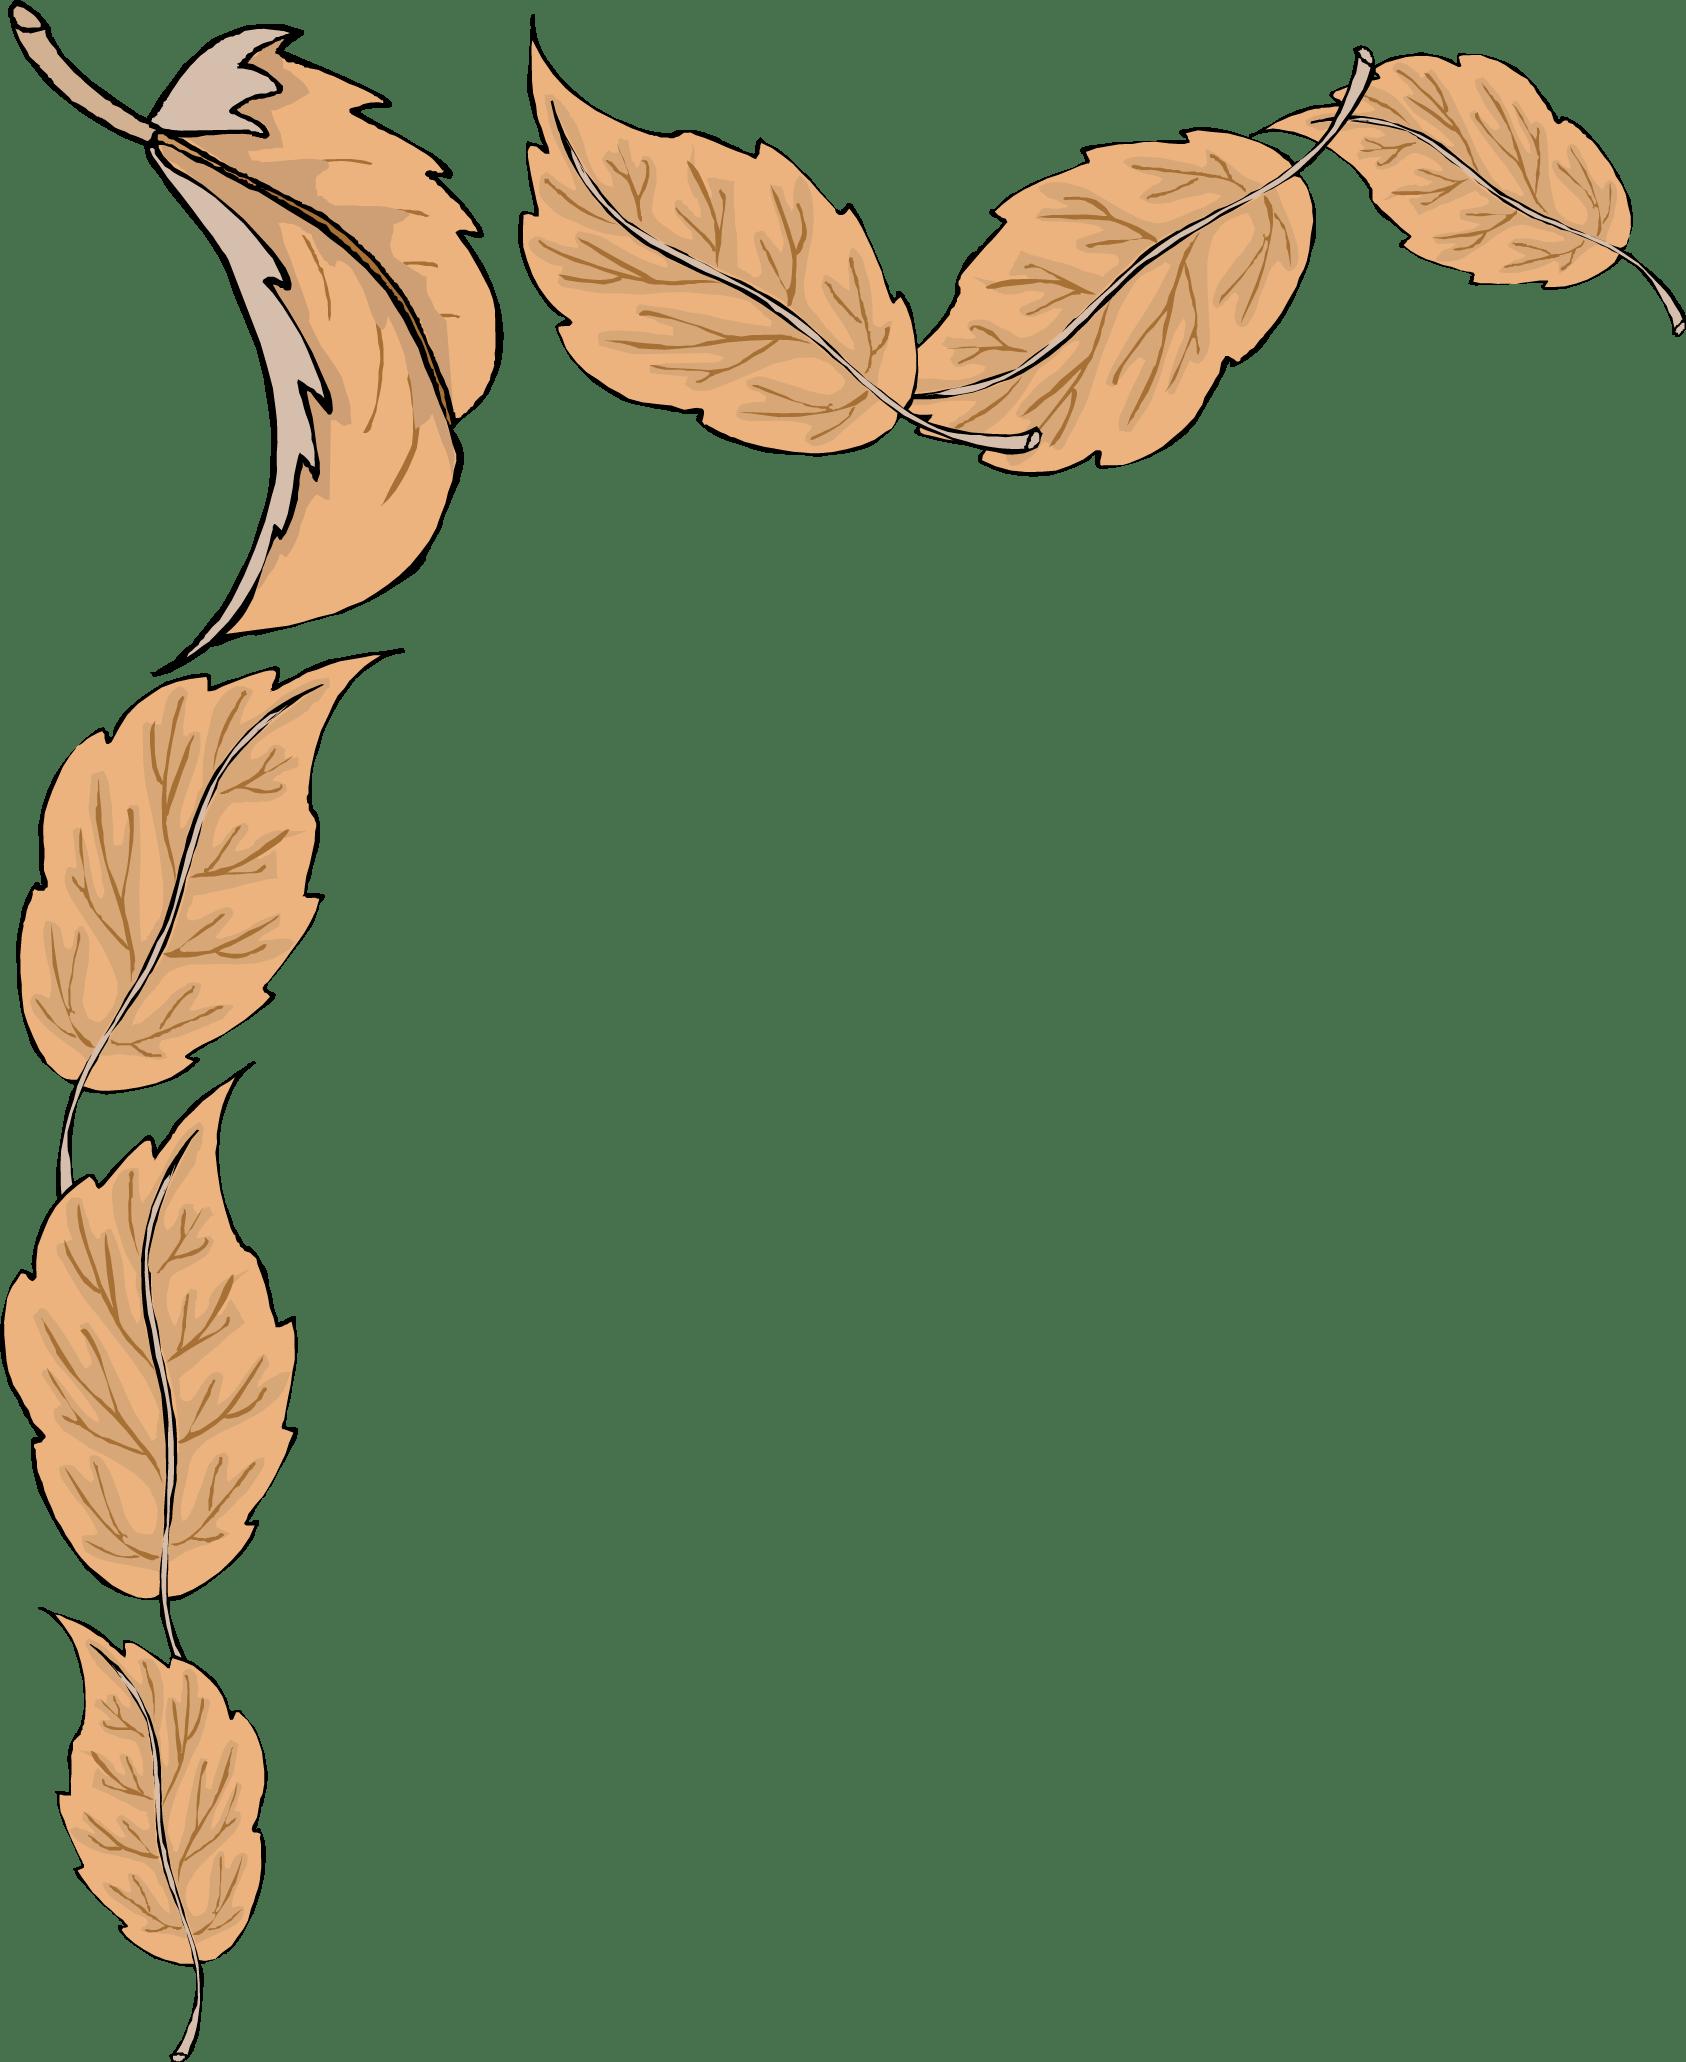 Fall Borders Free - ClipArt Best (1686 x 2062 Pixel)